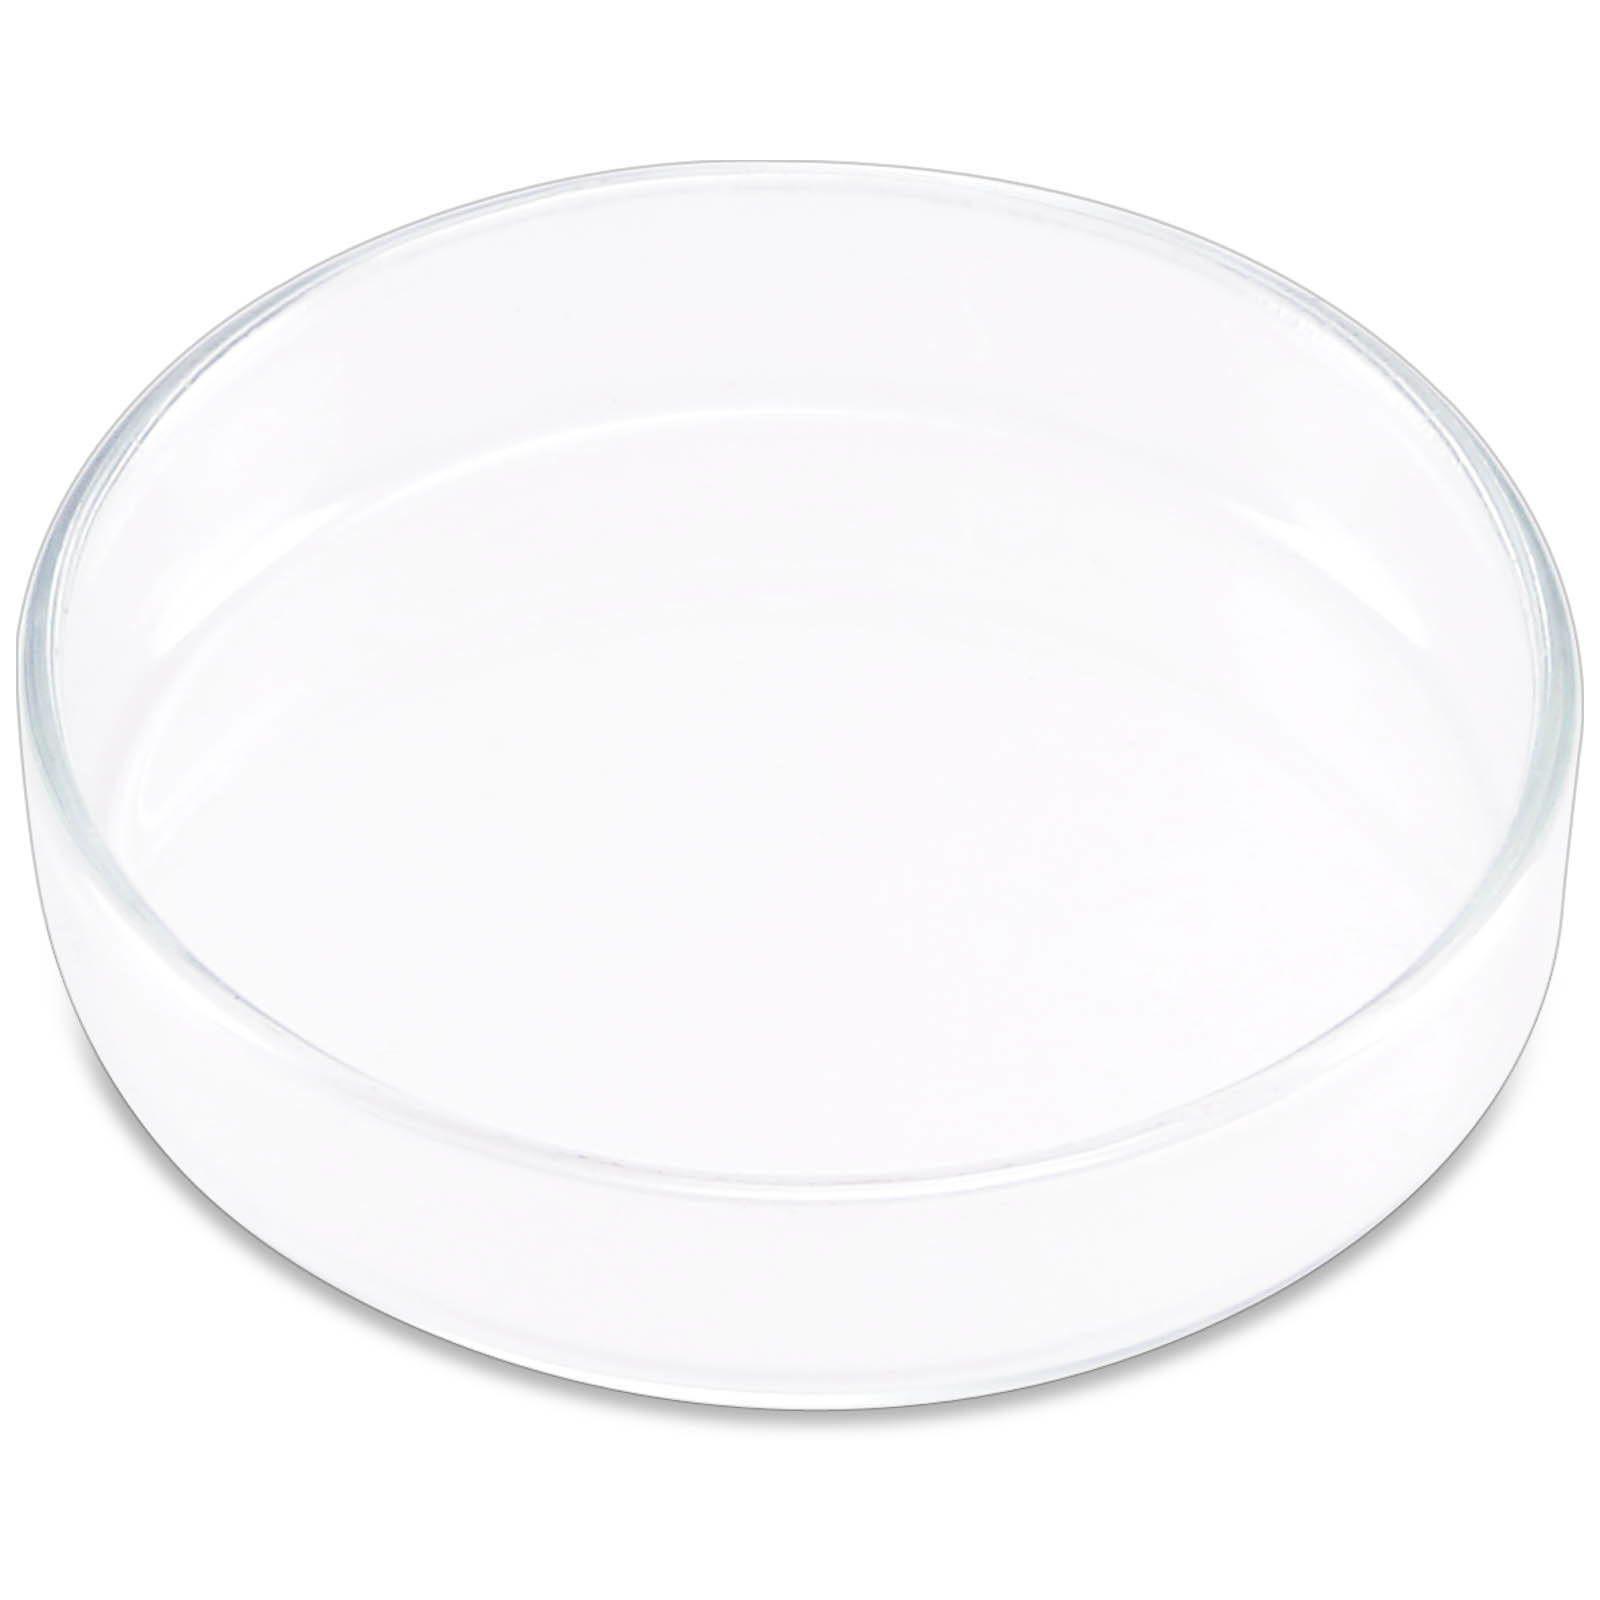 H-series Glass Feeding Dish for Shrimp